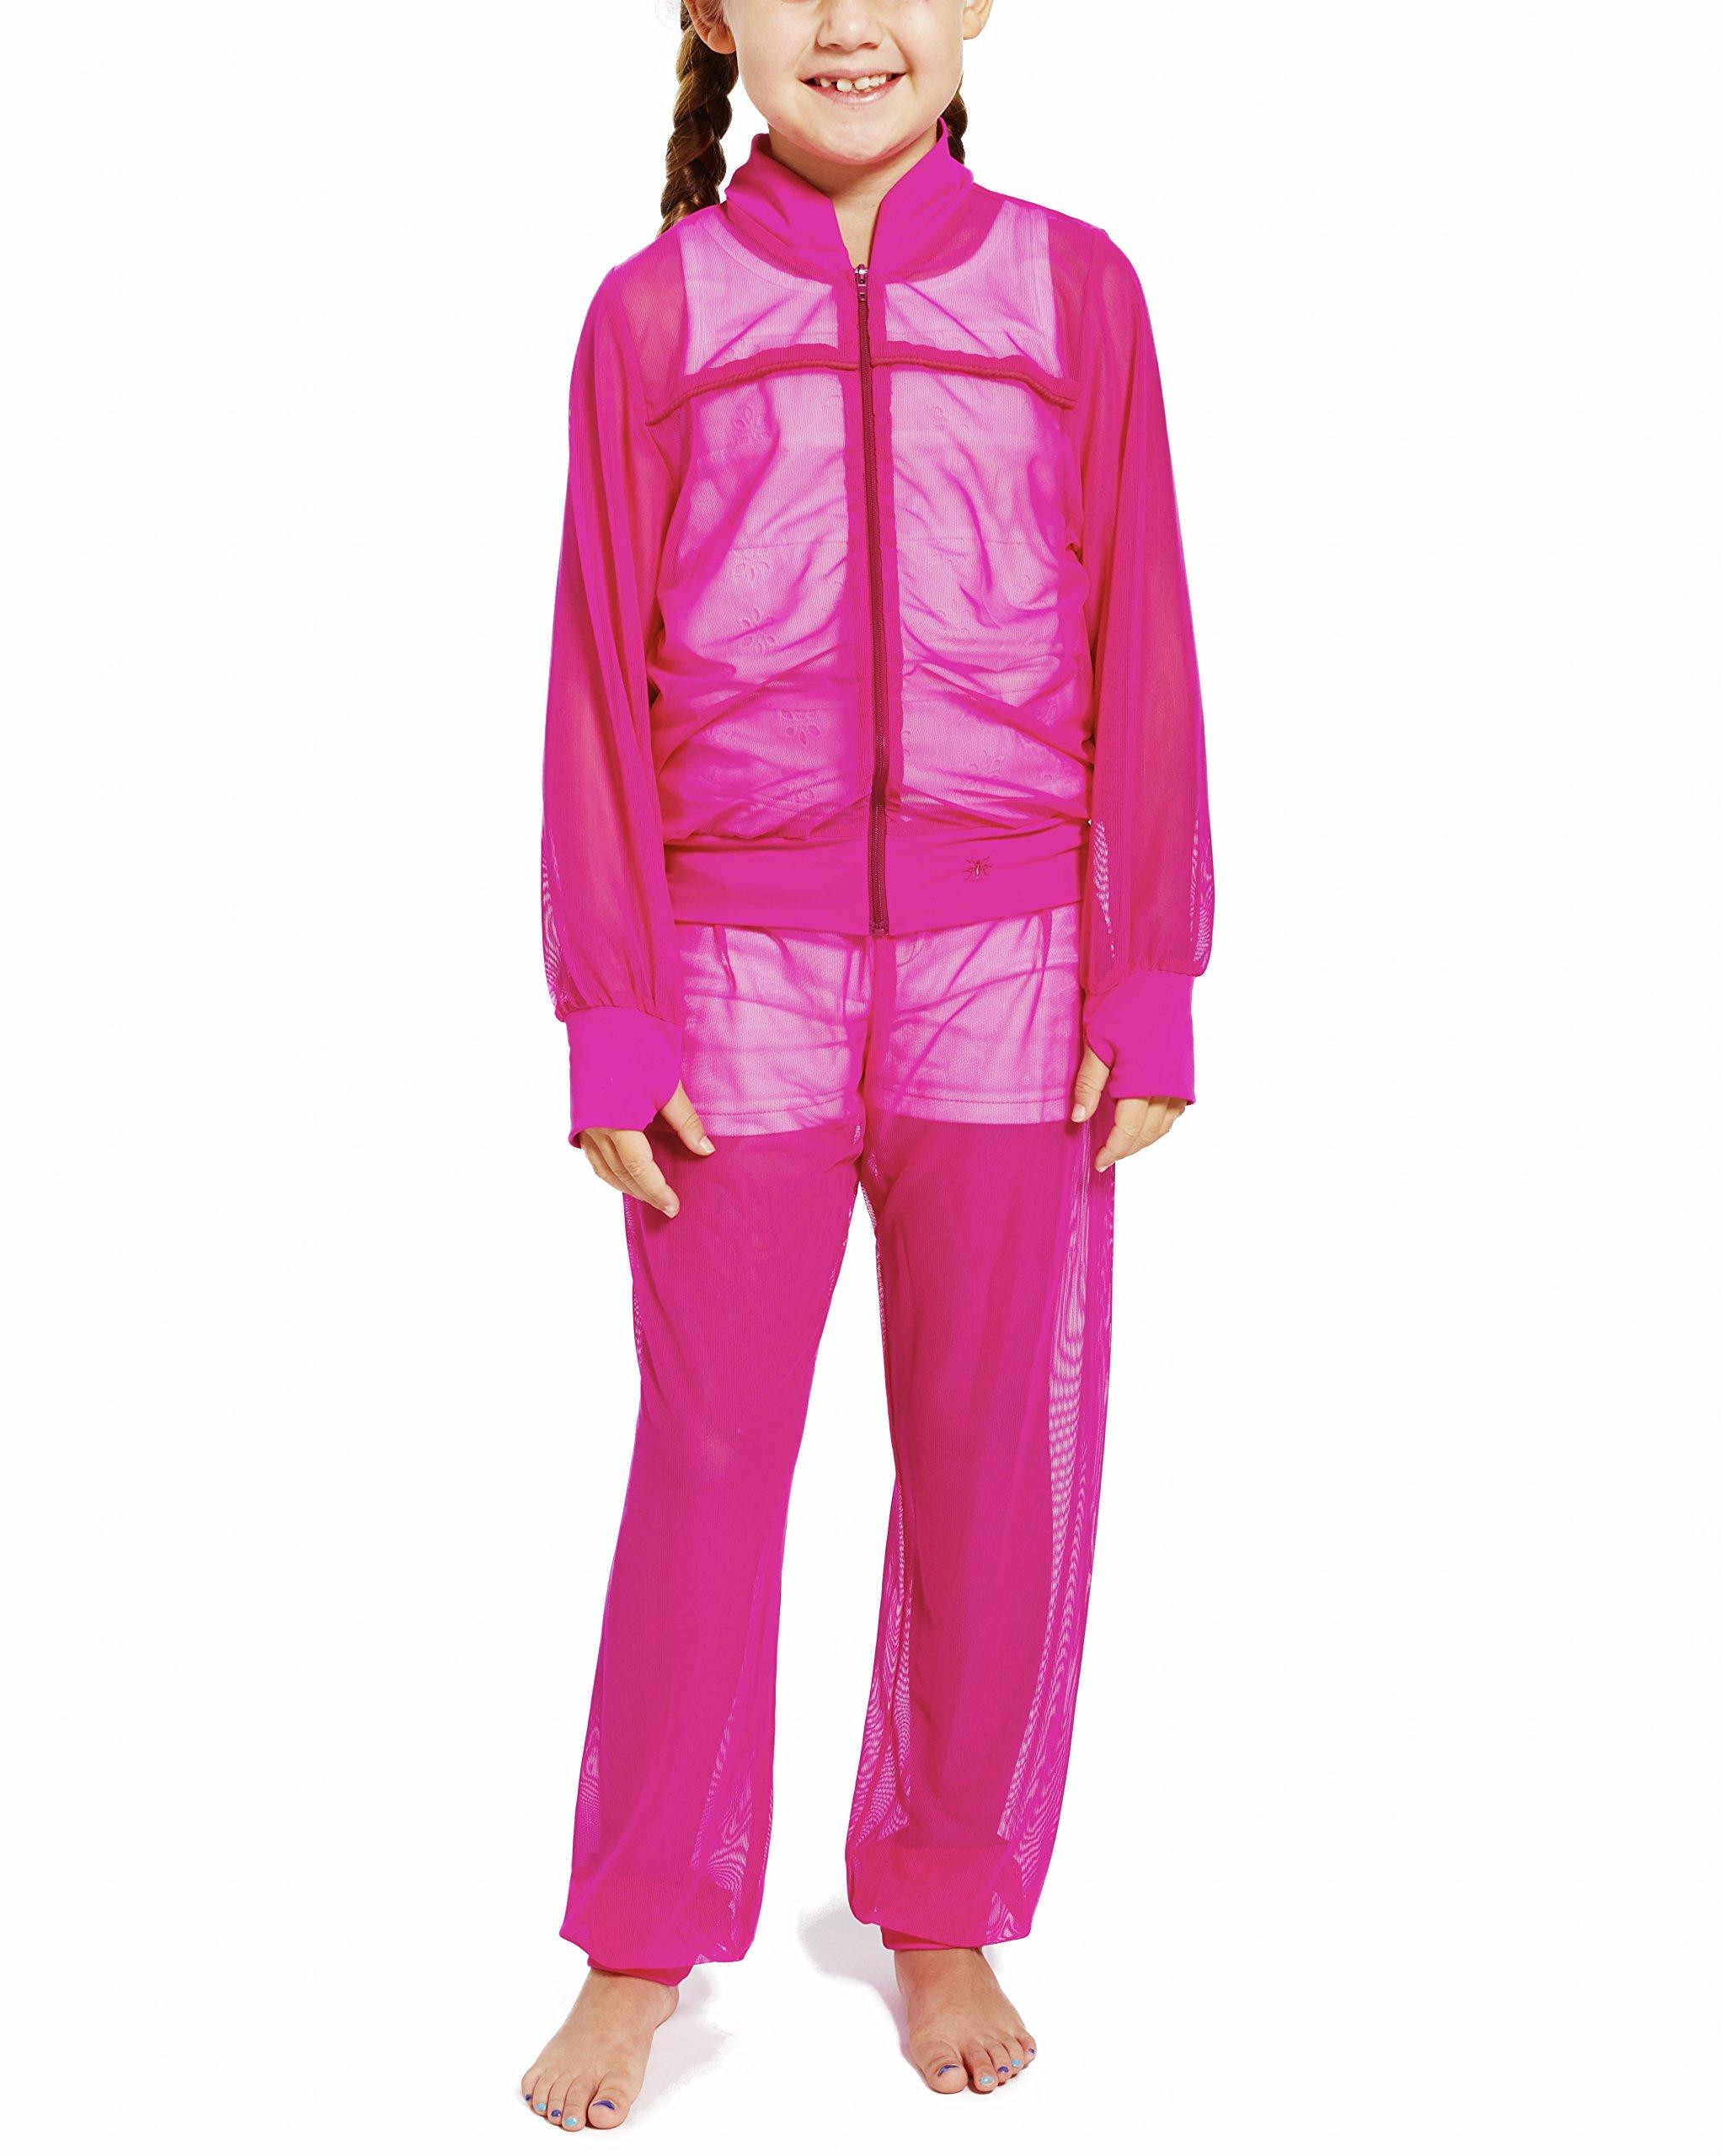 LIL&TESS Resort Mesh Kids Tracksuit (XL, Hot Pink)